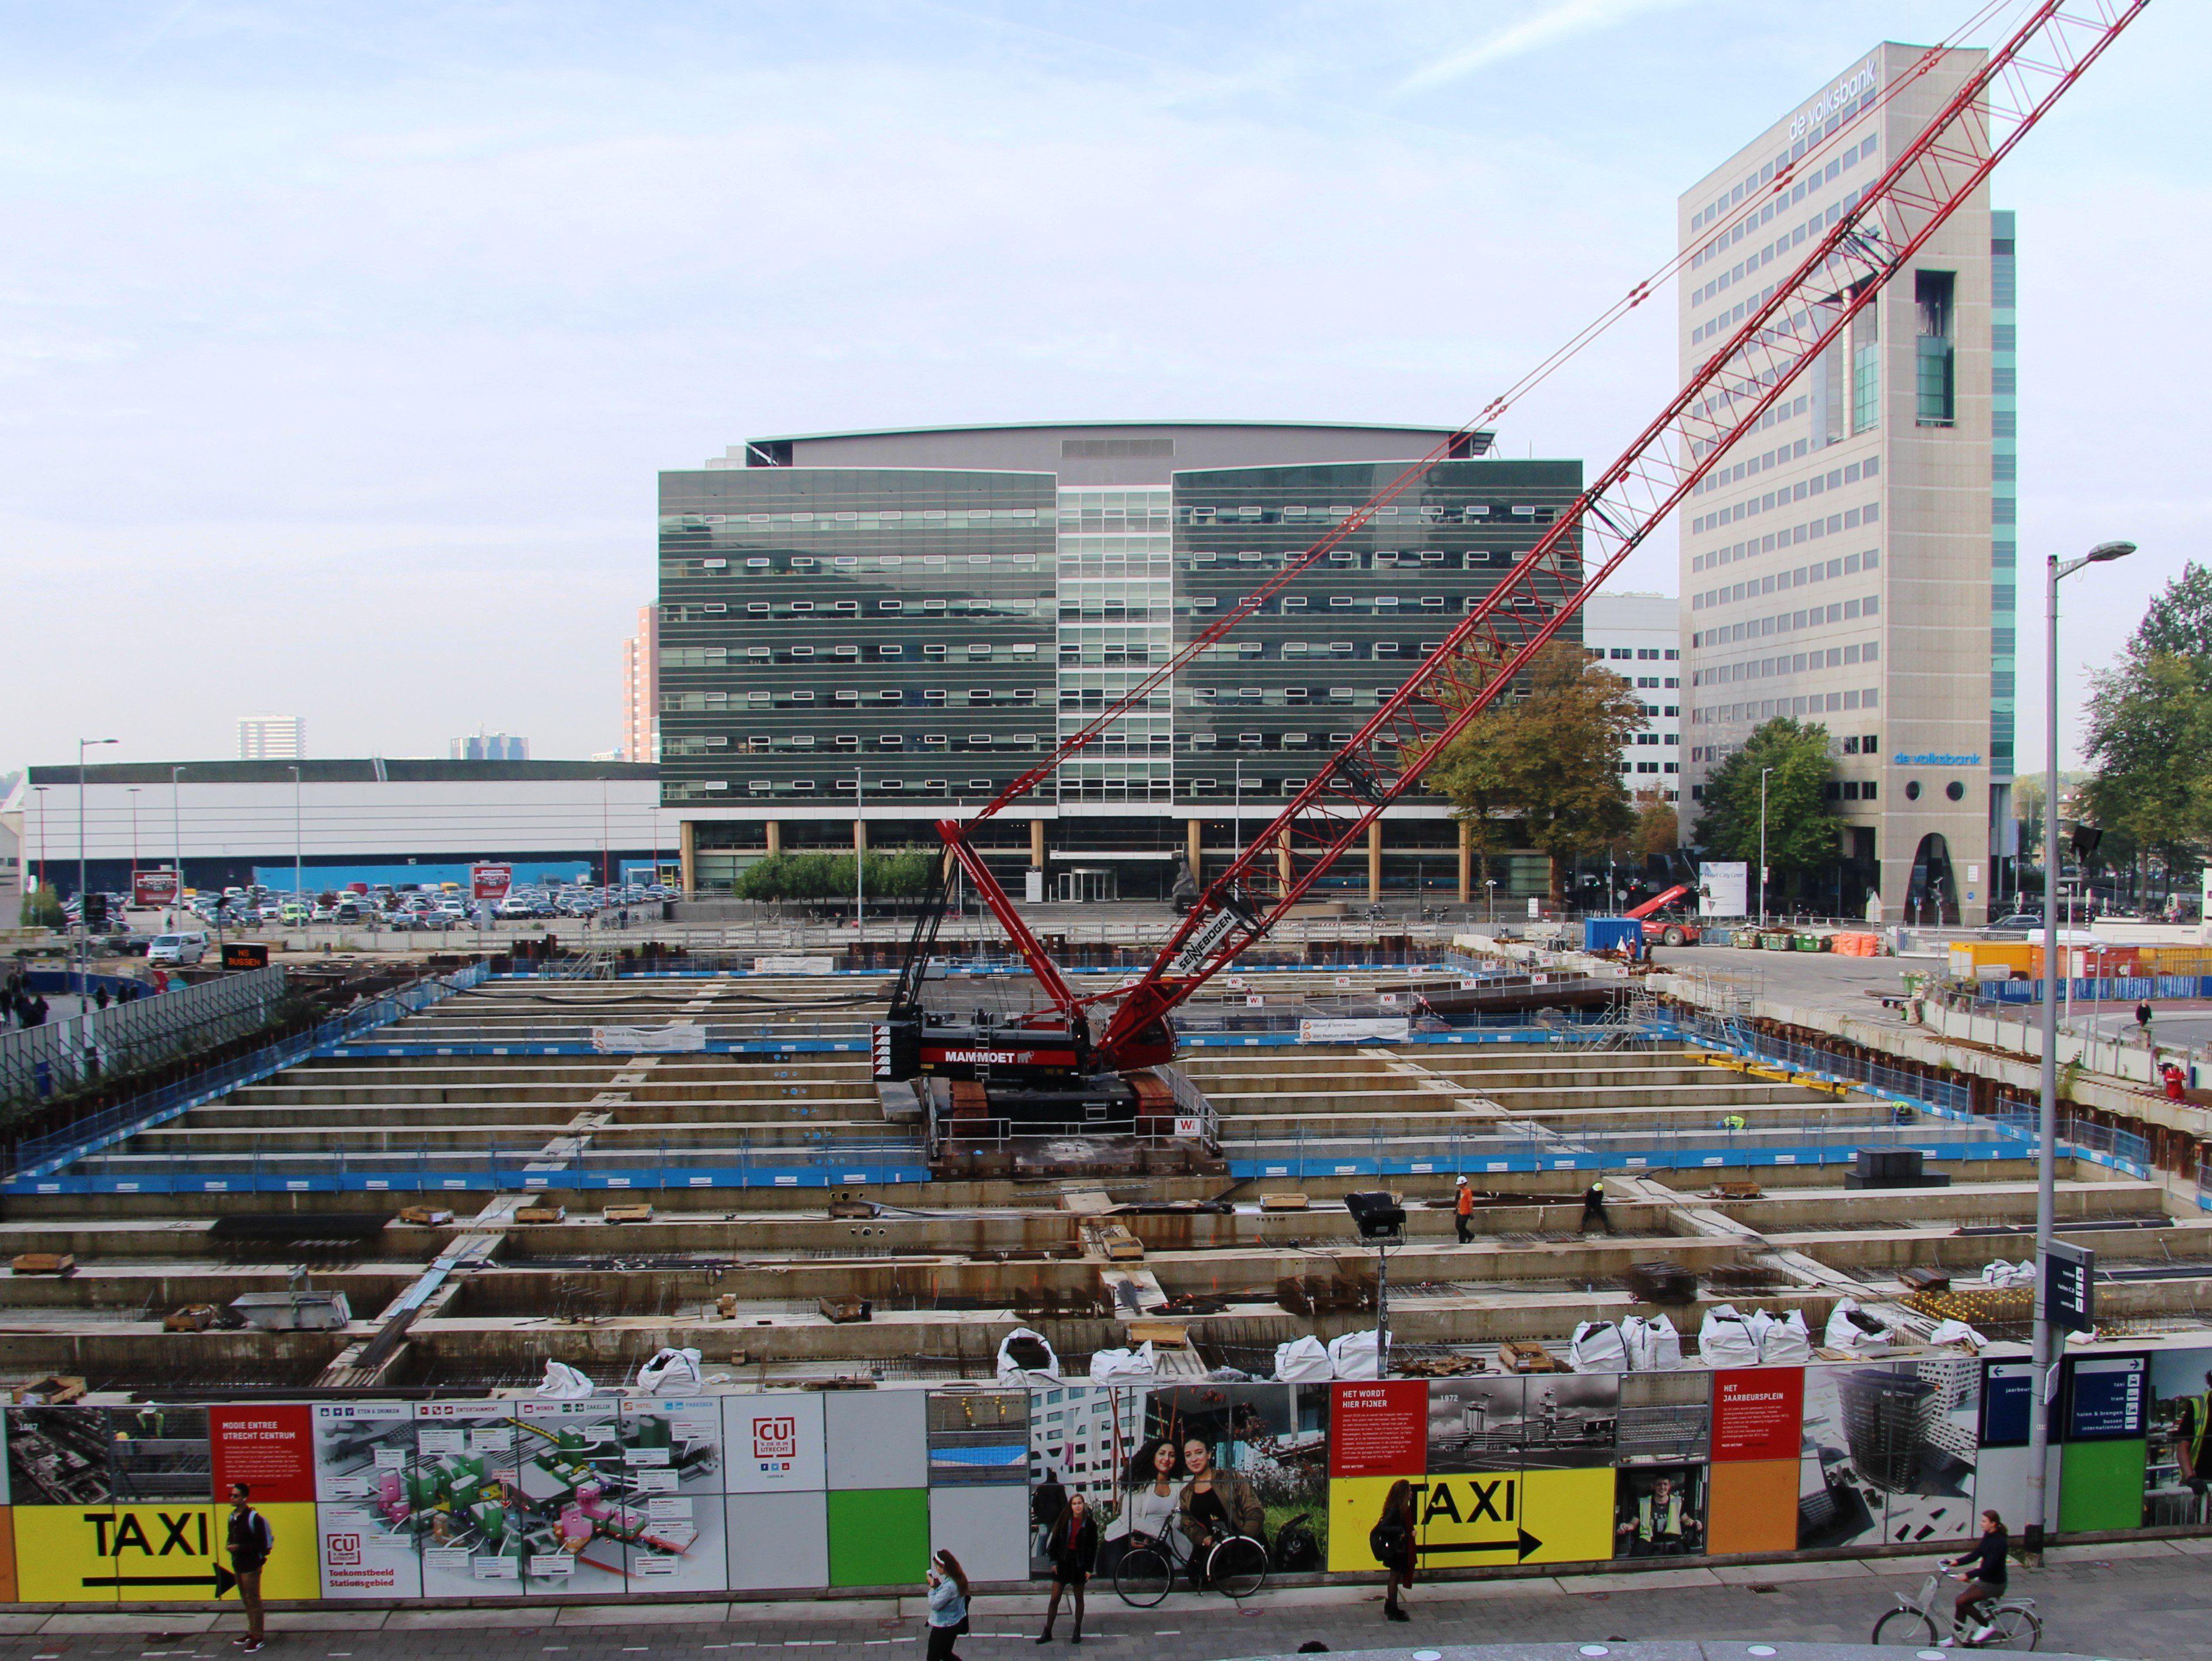 Parkeergaerage Jaarbeursplein Utrecht, kraan, stempelraam